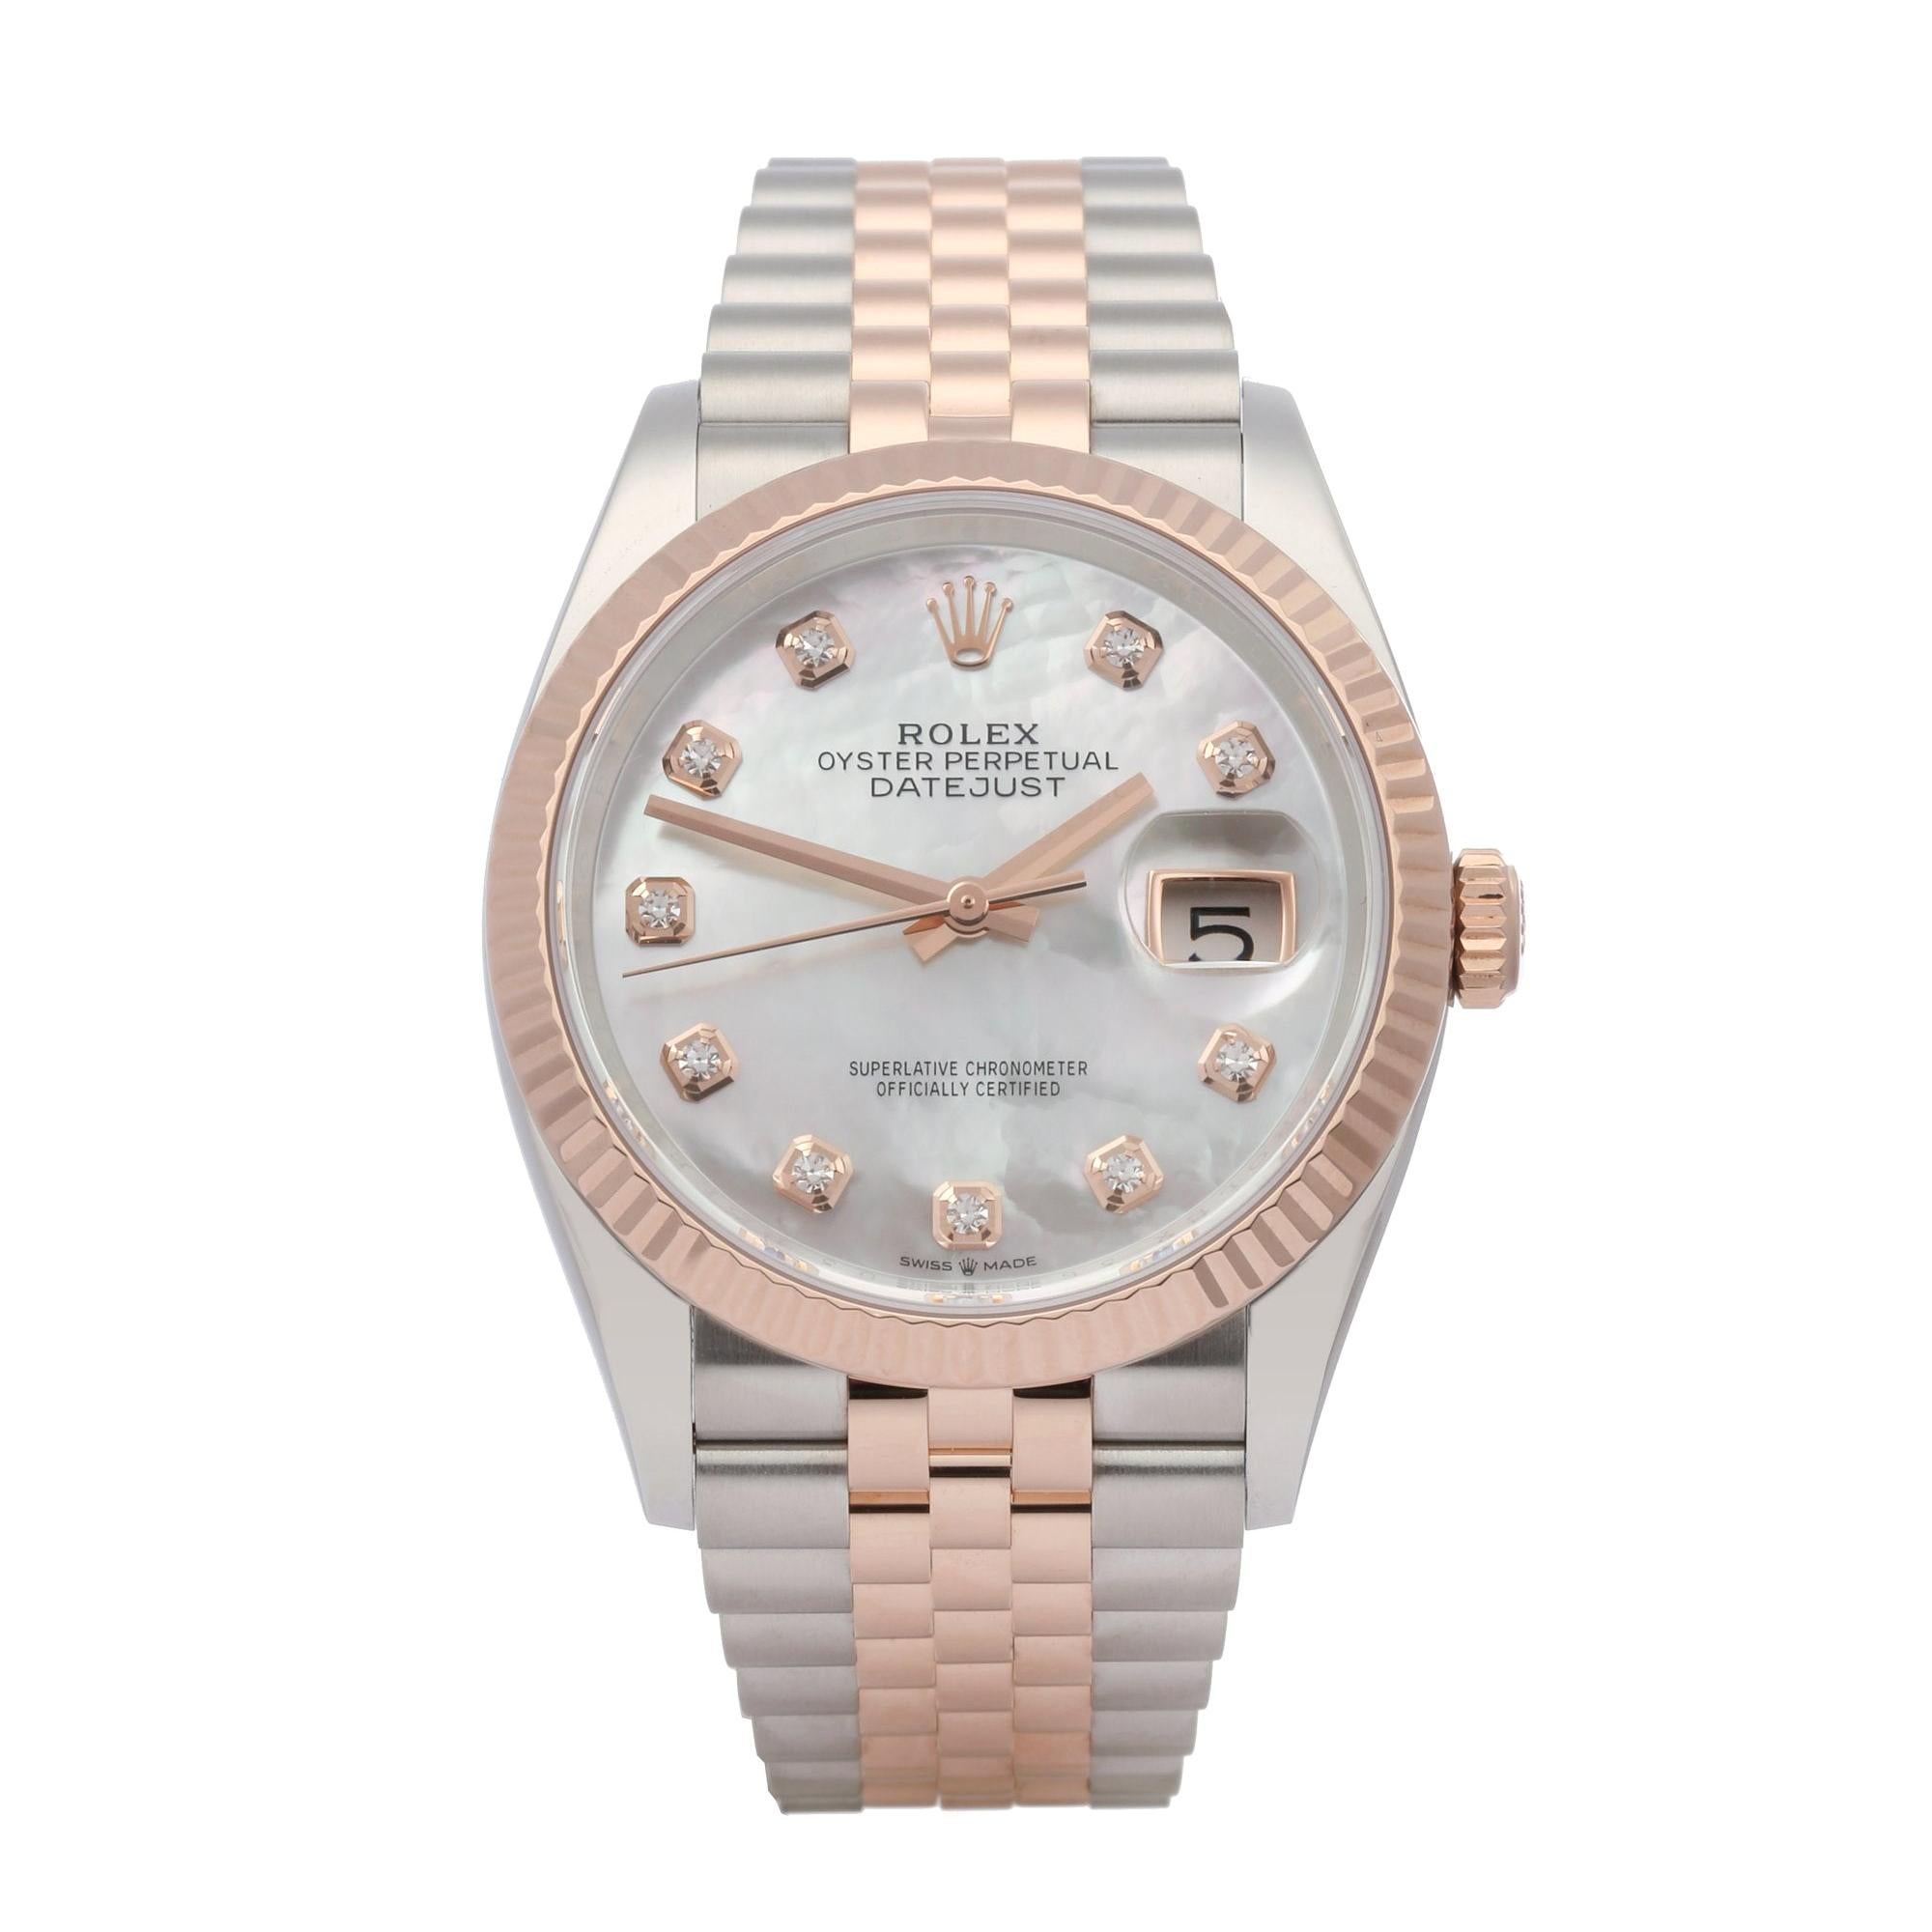 Rolex Datejust 36 126231 Unisex Rose Gold & Stainless Steel Watch